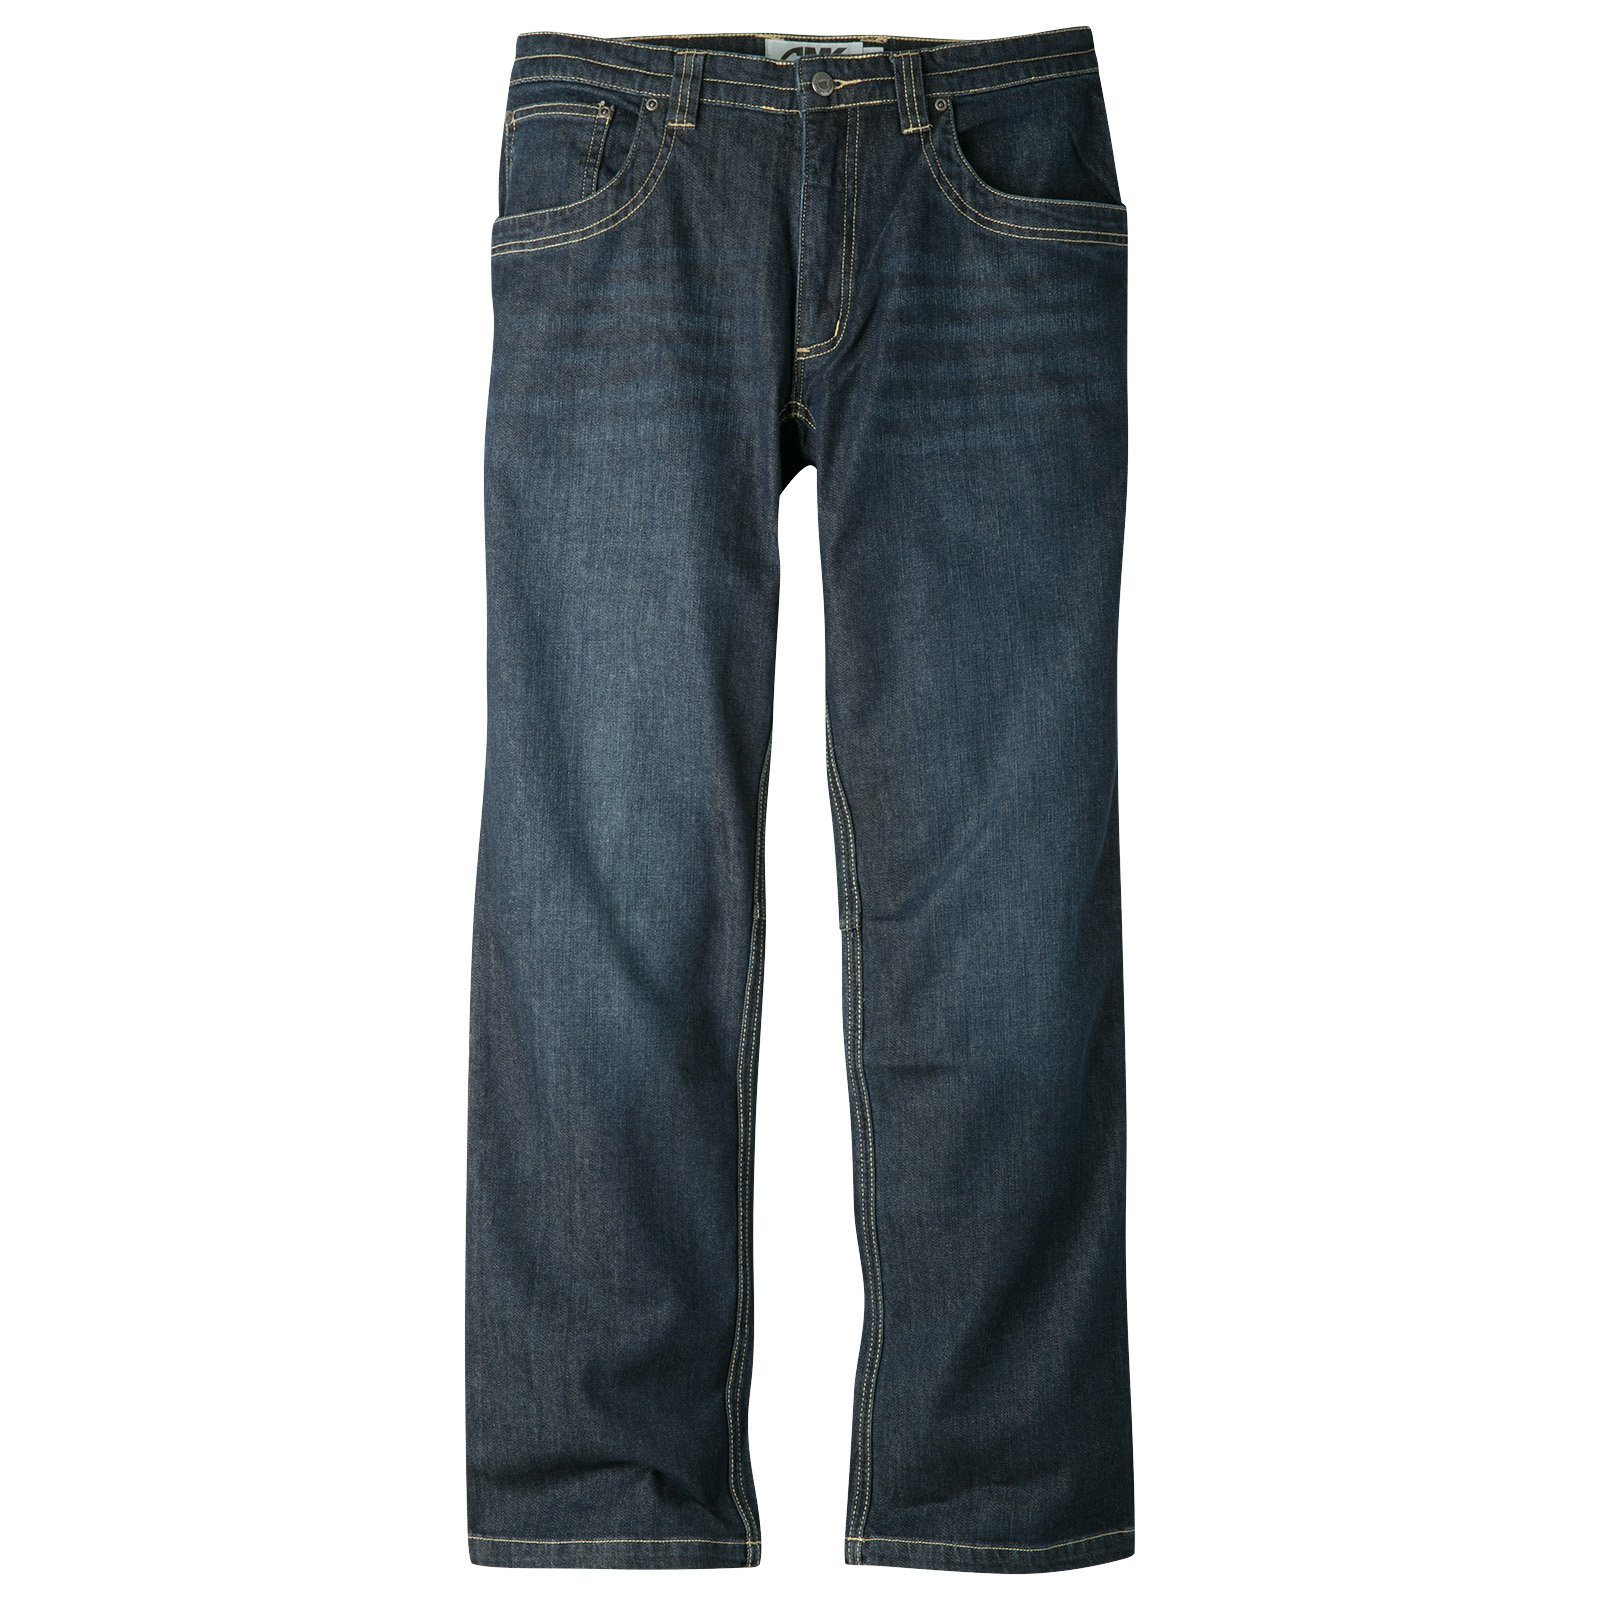 MK Men's Camber 109 Jean